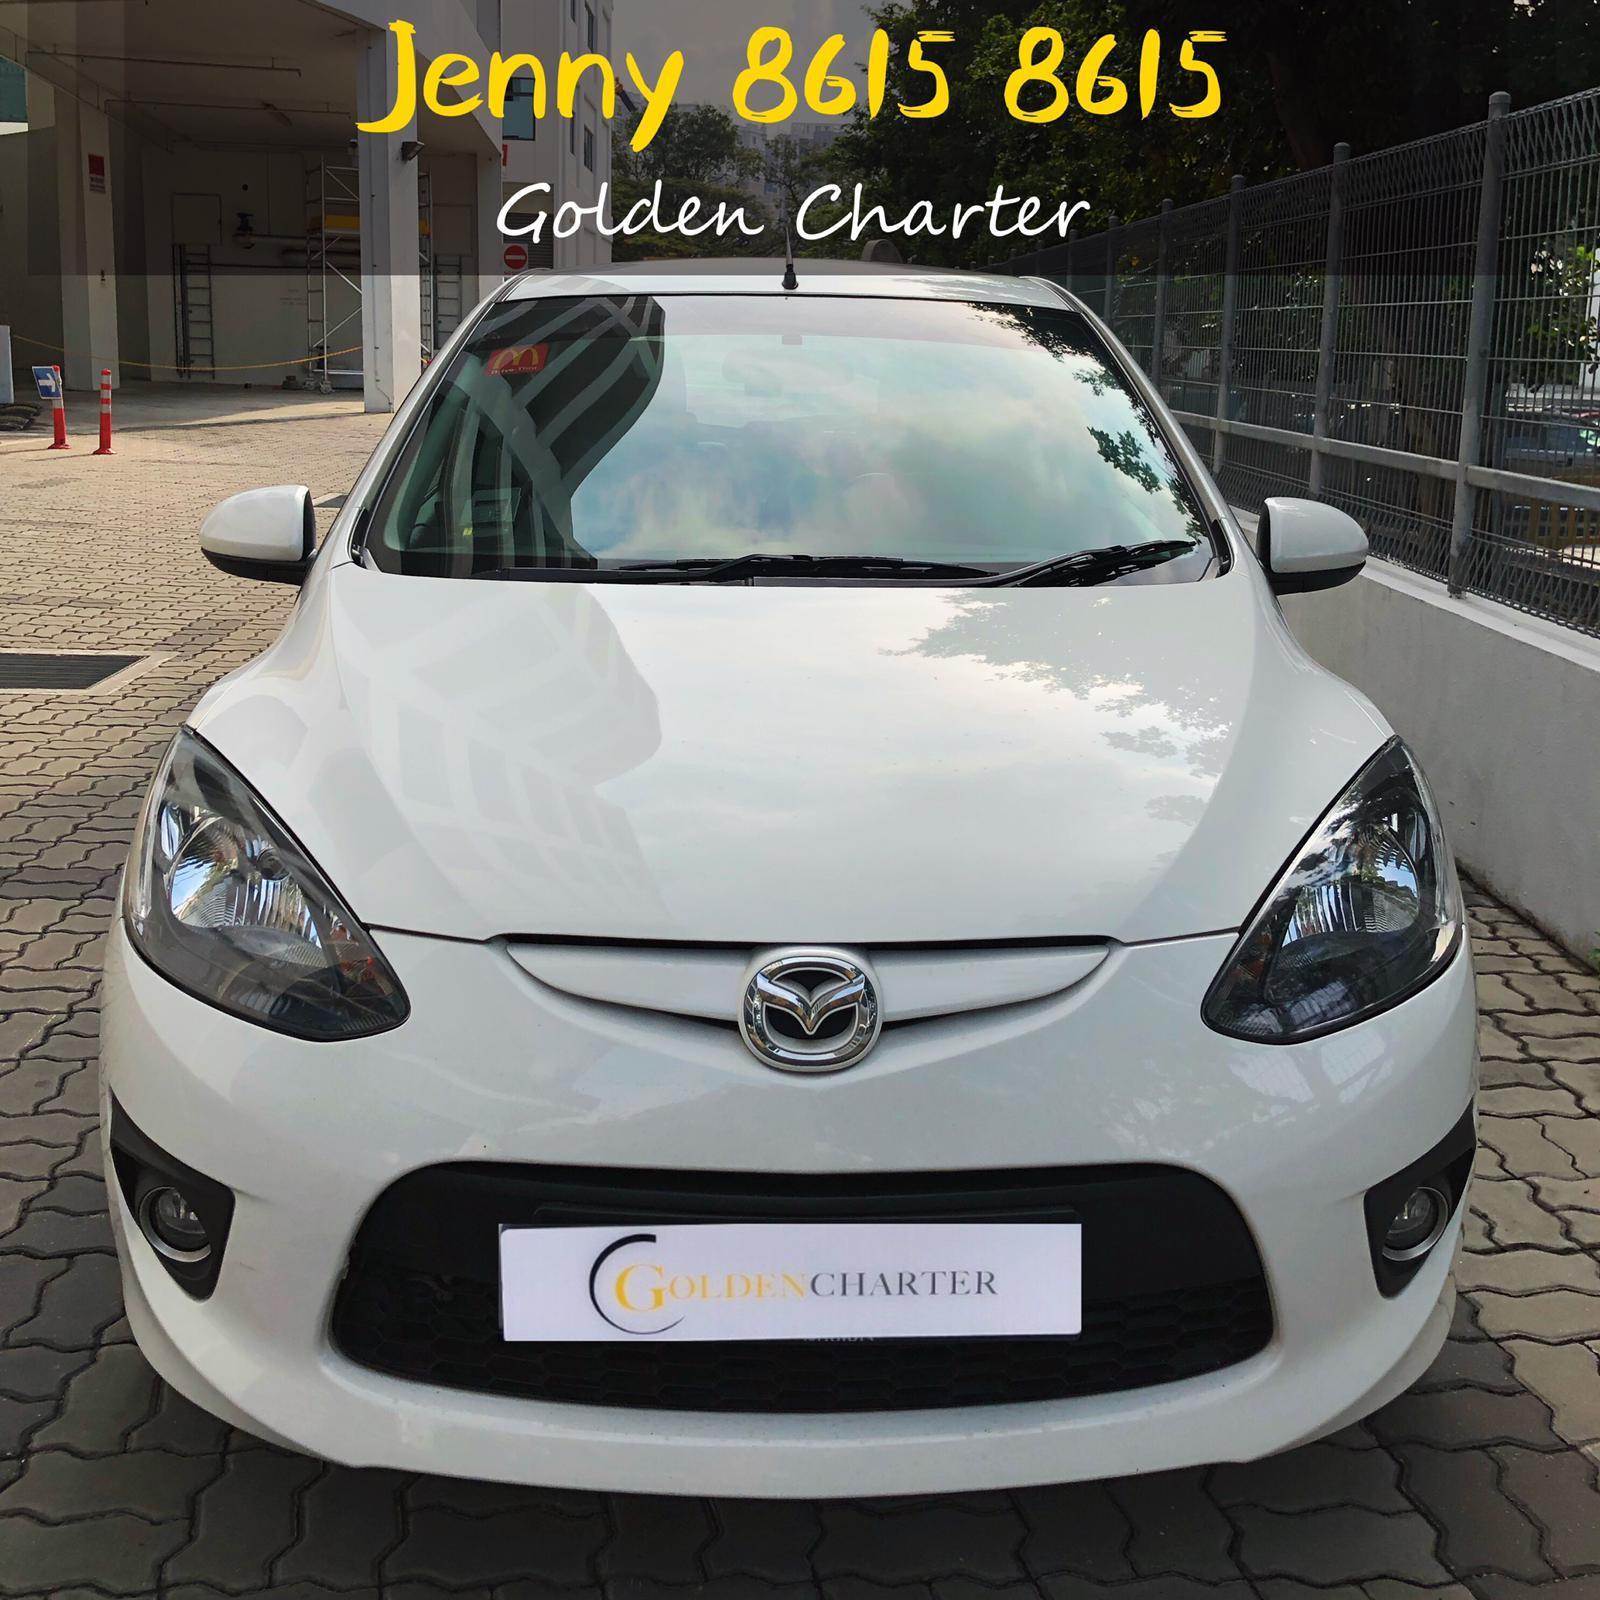 Mazda 2 $46 gojek rebate hatchback honda fit jazz toyota personal use,grab or gojek.phv ready stream wish mpv 7seater